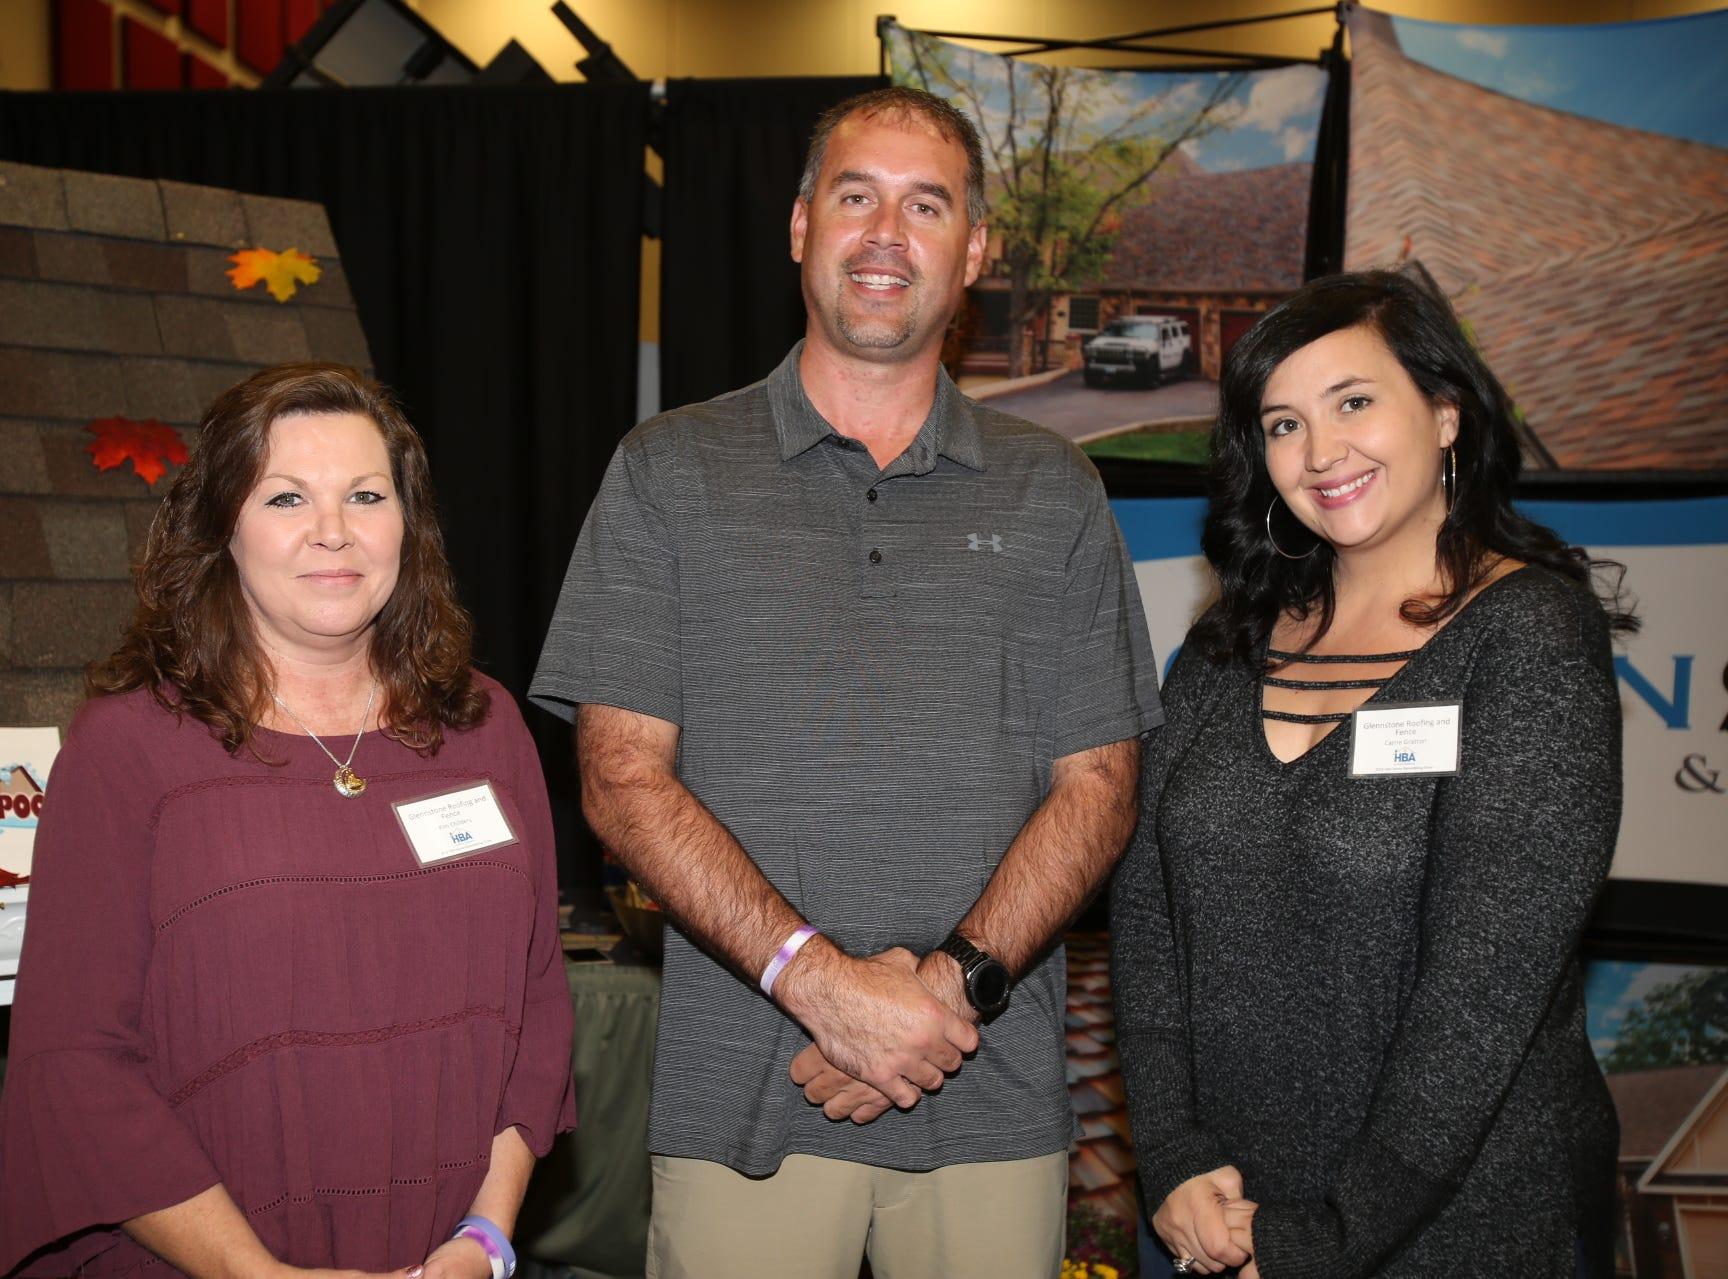 Kim Childers, Glenn Sanders, and Cami Gratton